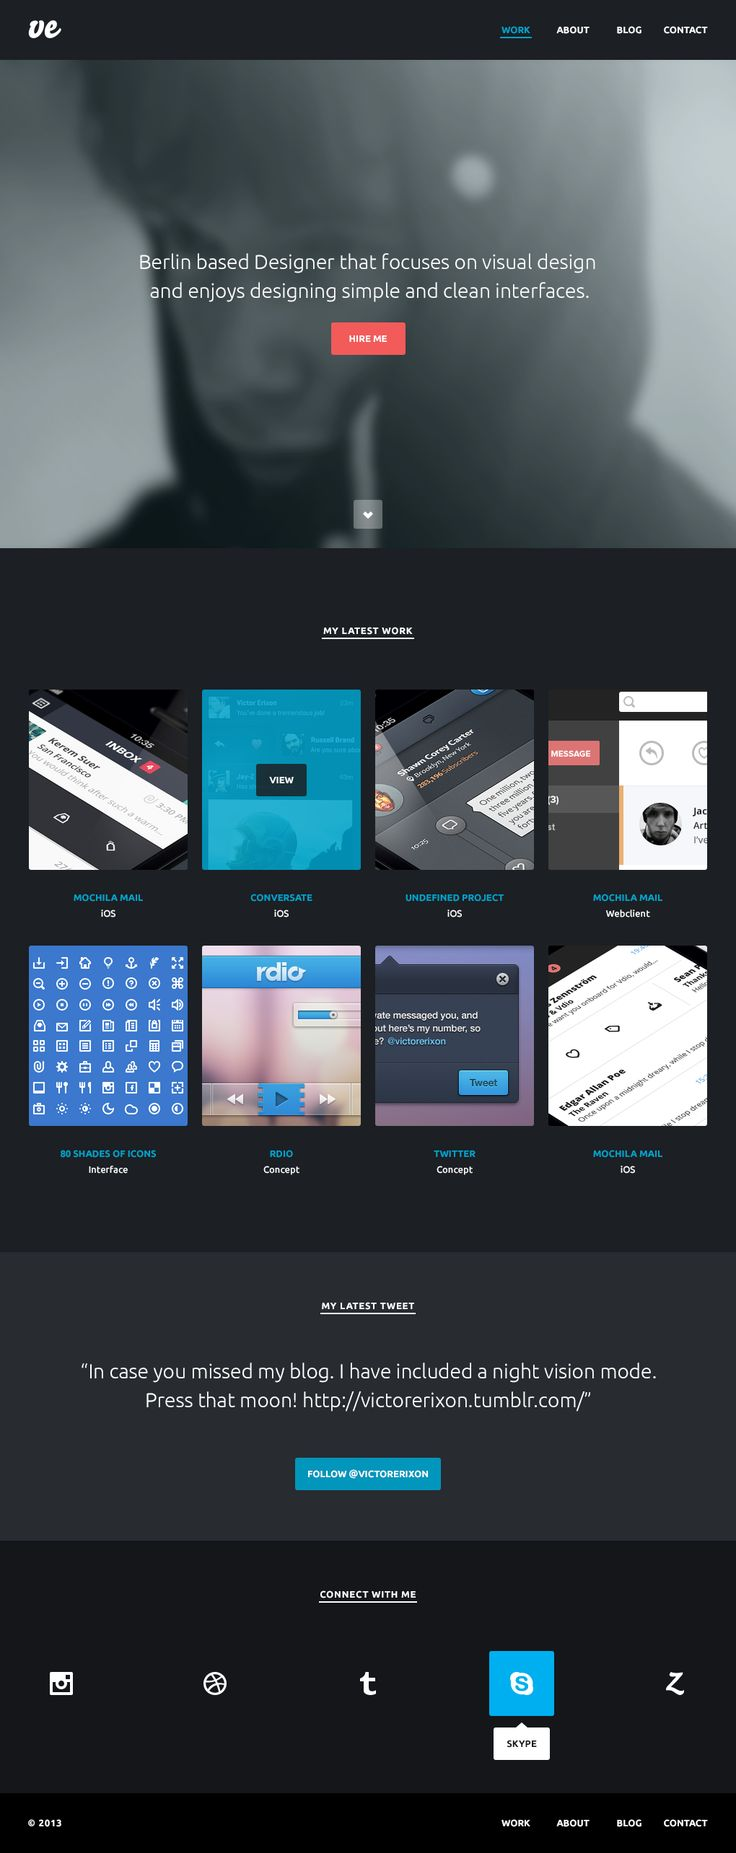 #Web #Portfolio #Design #Concept | #mobile #ui #ux #inspiration #identity #branding #simple #clean